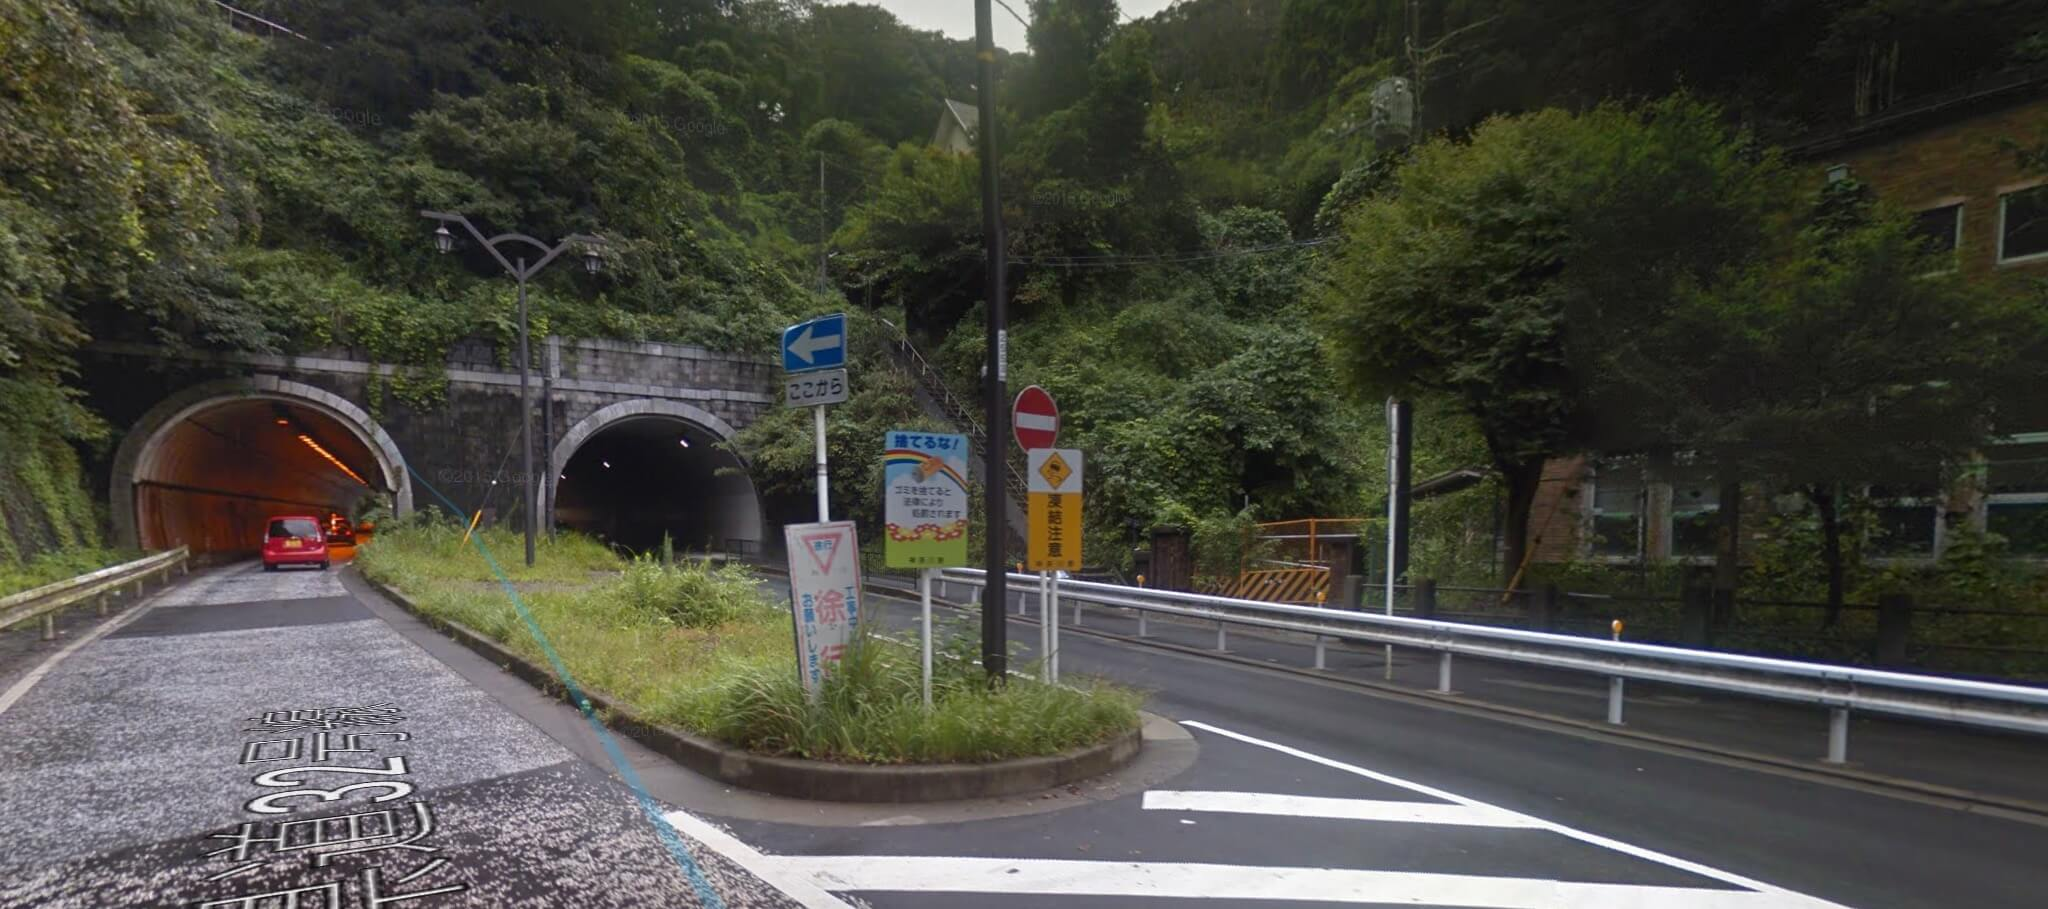 Start of the Big Buddha Kamakura hiking trail